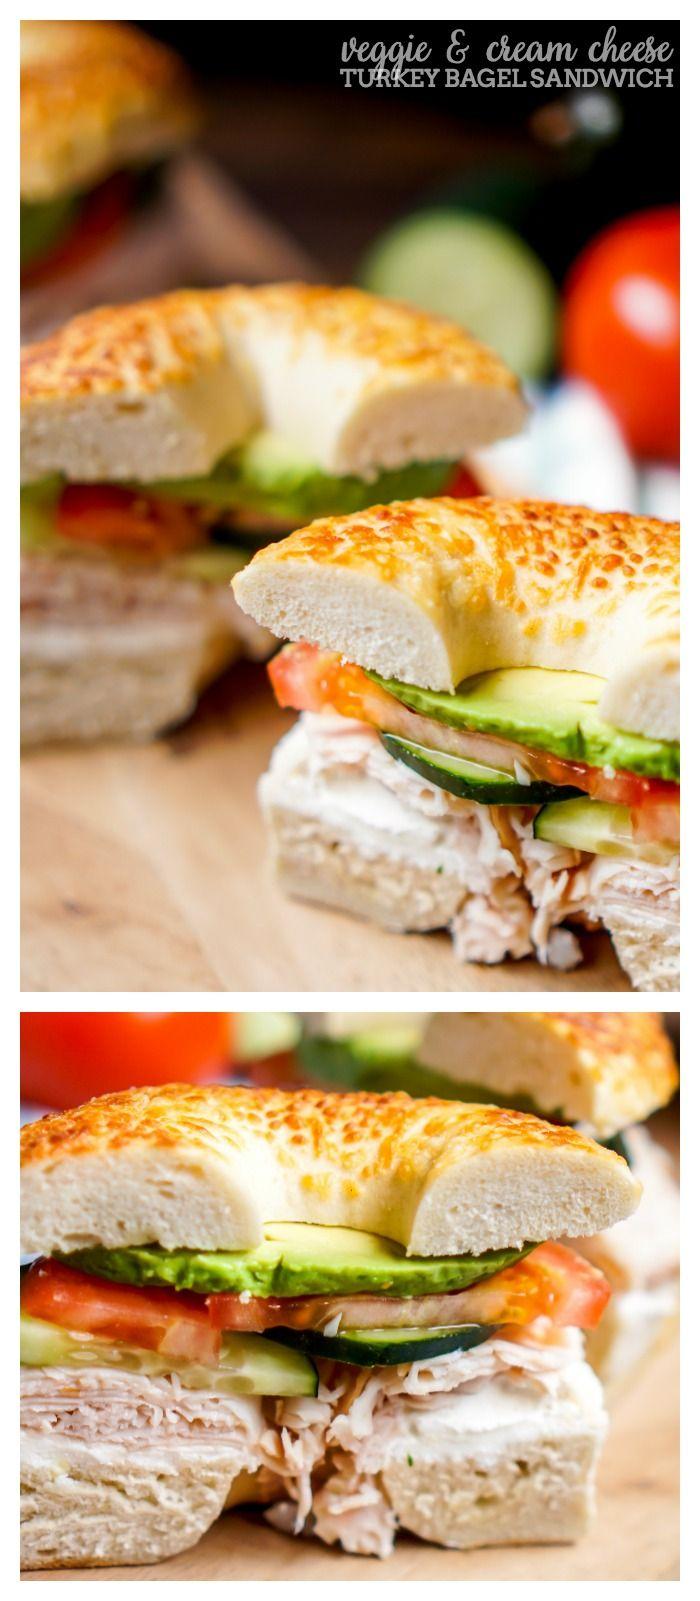 Veggie and Cream Cheese Turkey Bagel Sandwich - Spruce up lunch with a tasty bagel sandwich filled with delicious cream cheese, turkey and fresh veggies! | The Love Nerds